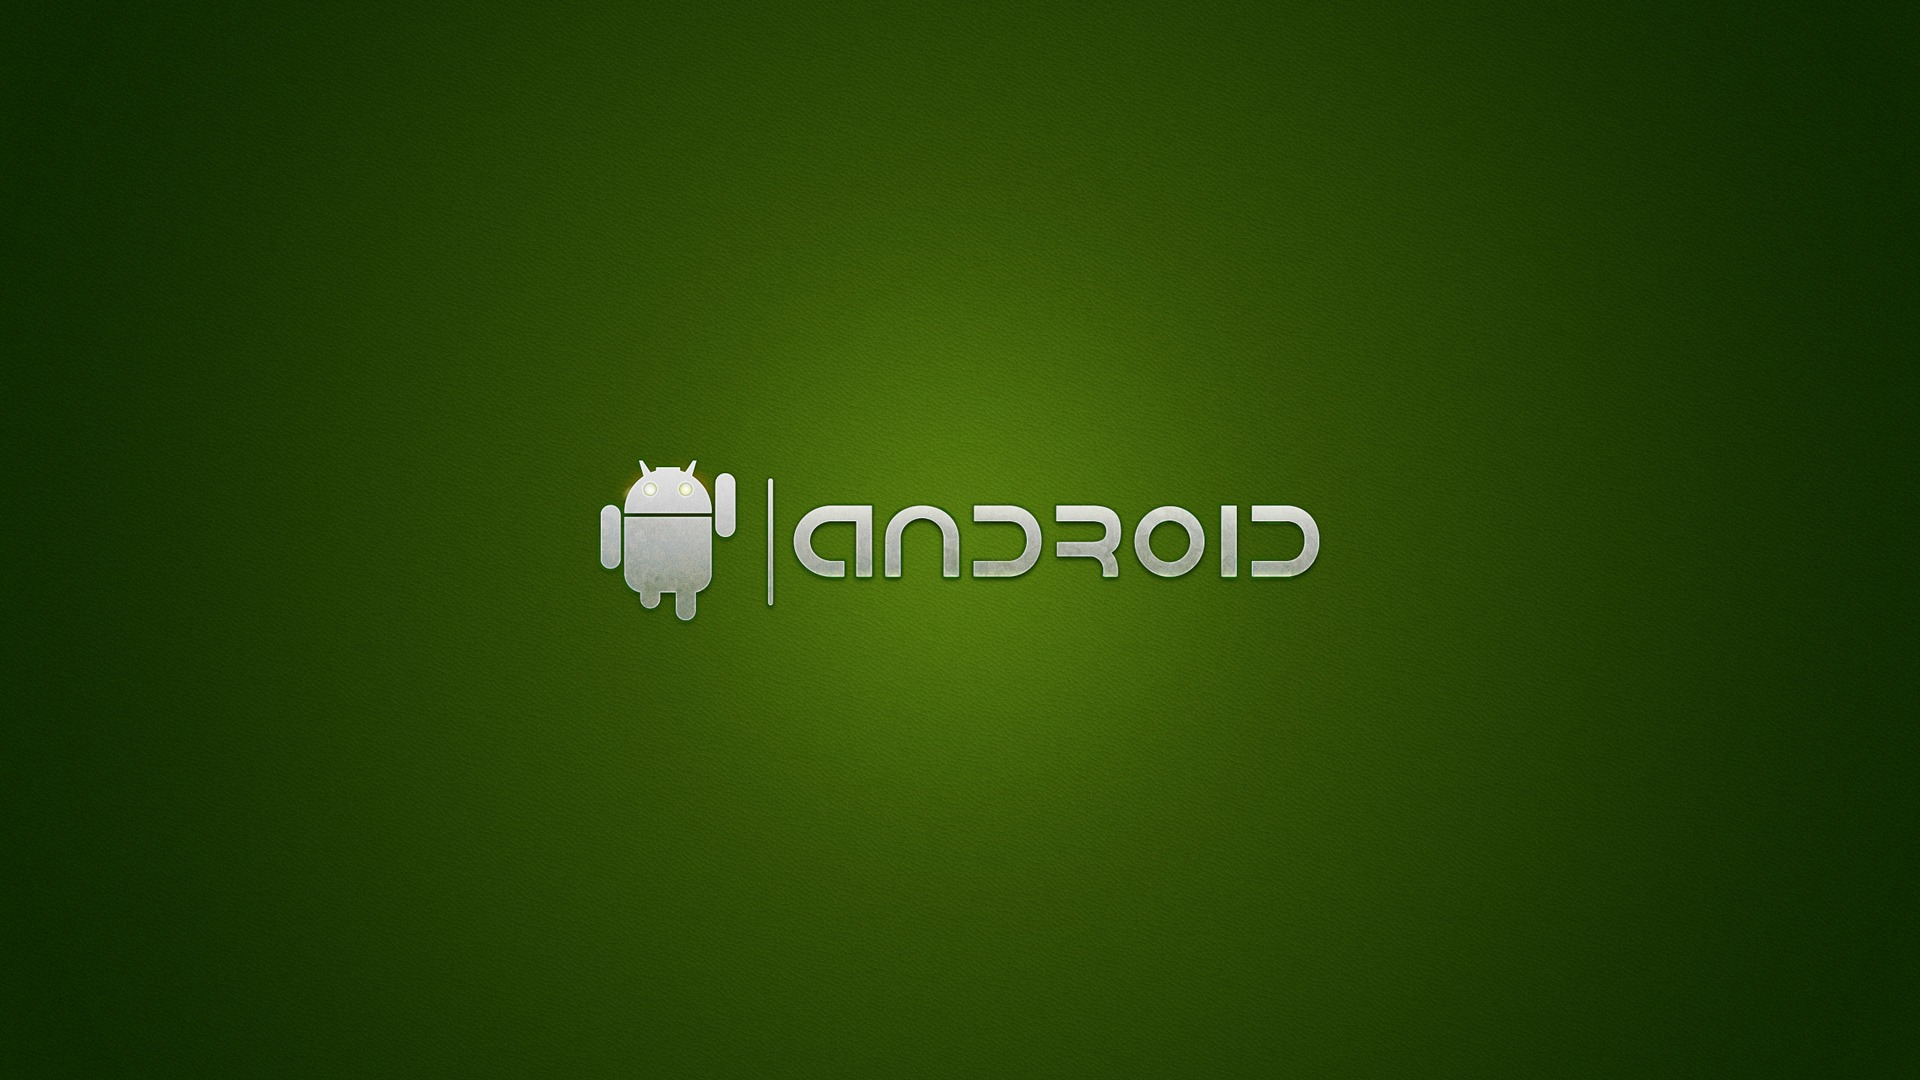 500 fondos de pantalla en Full HD para tu Android   El Androide Libre 1920x1080